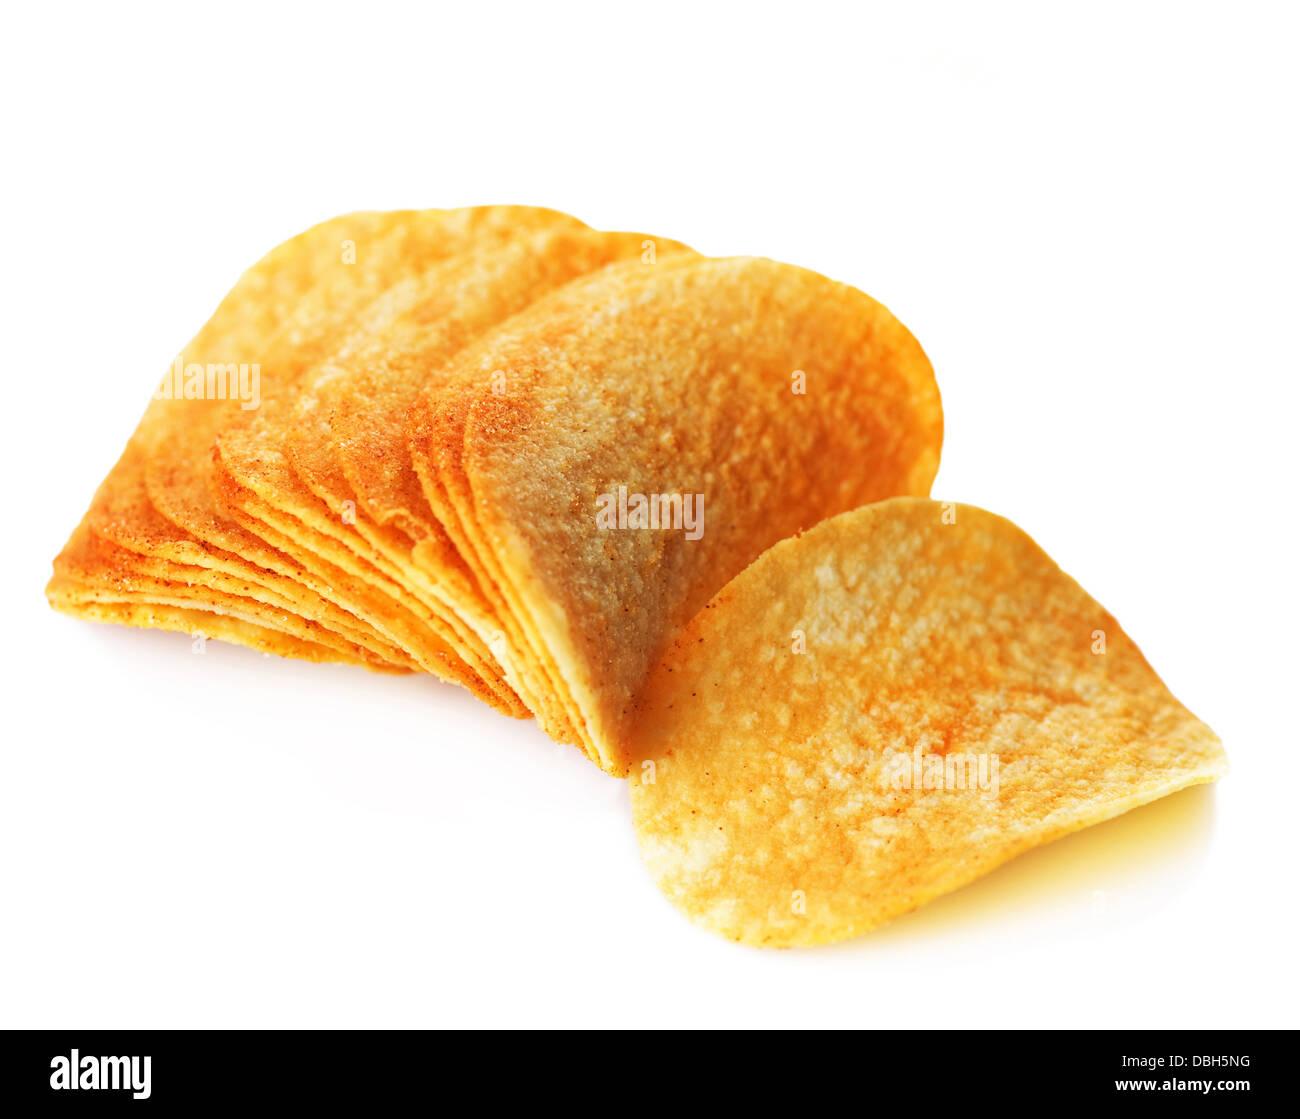 Potato Chips Over White - Stock Image